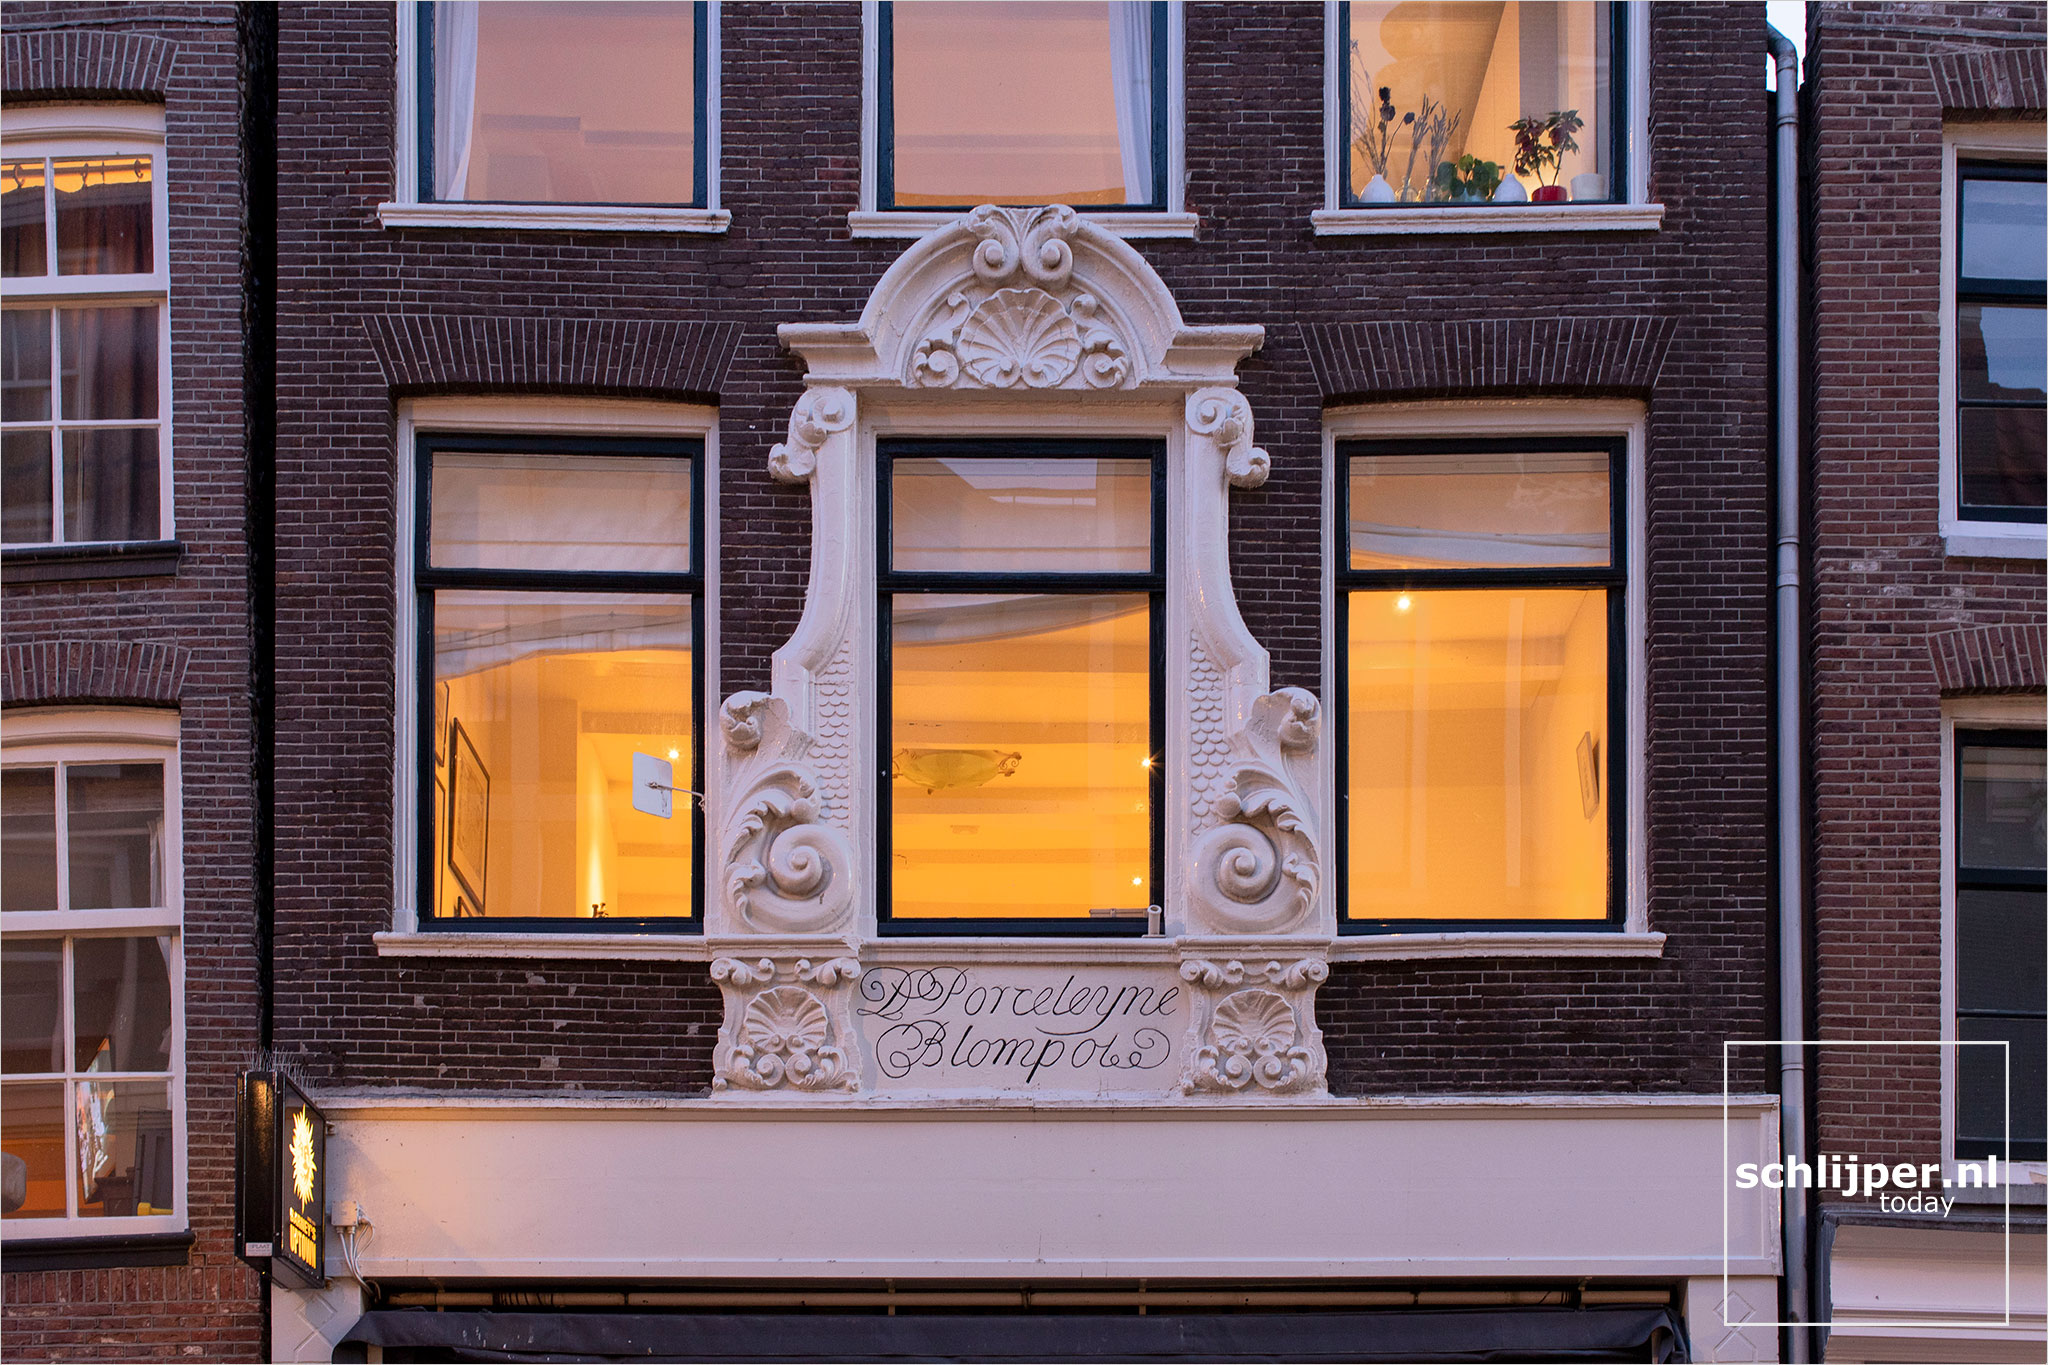 The Netherlands, Amsterdam, 7 mei 2021